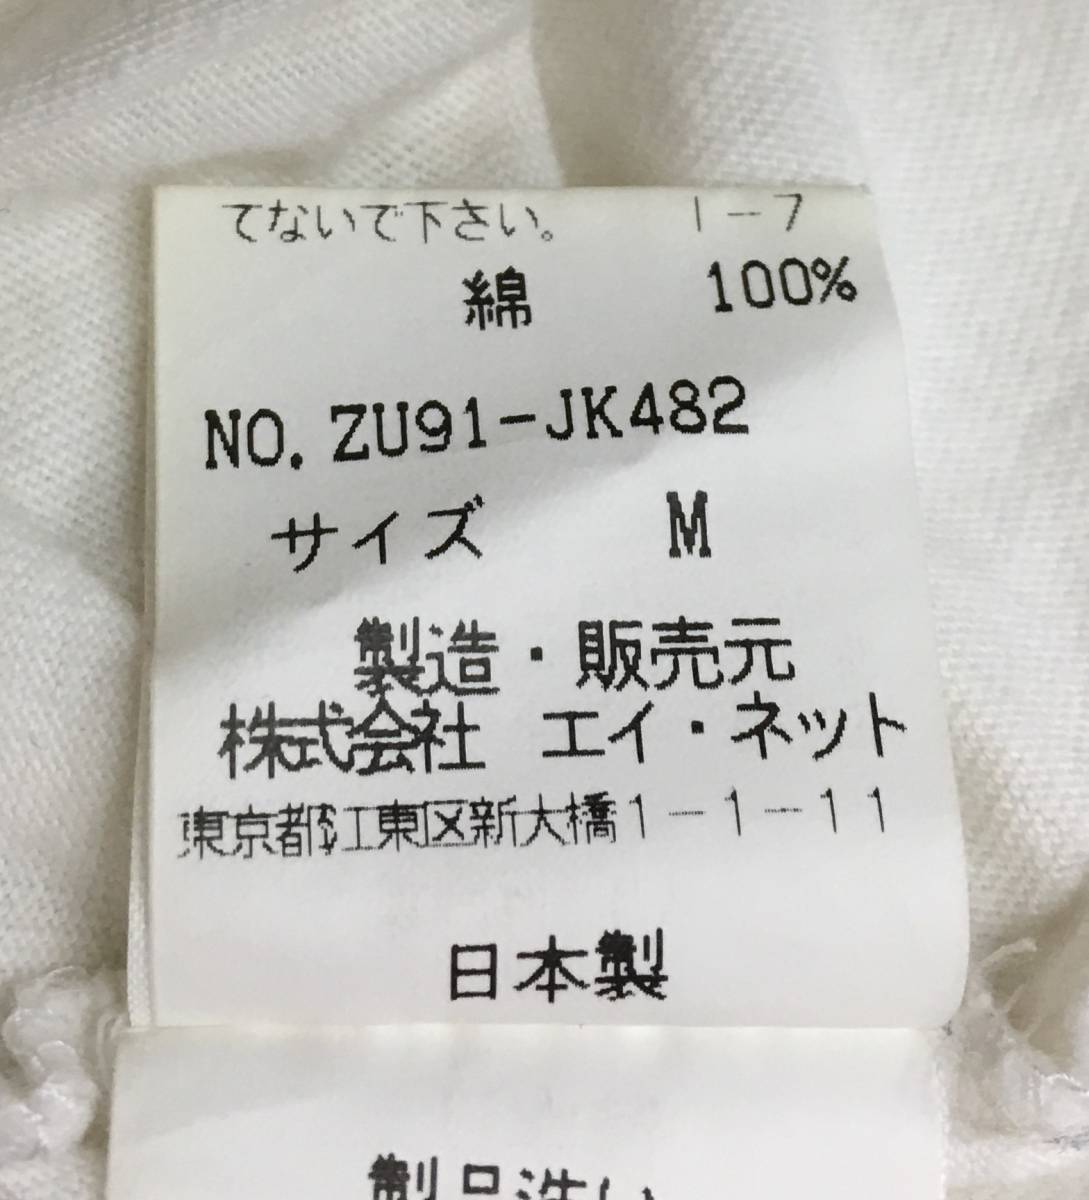 zucca ズッカ FUJIYAMA NEW ROCK SOUVENIR Tシャツ M ホワイト系 記念Tシャツ トップス 18082801_画像4